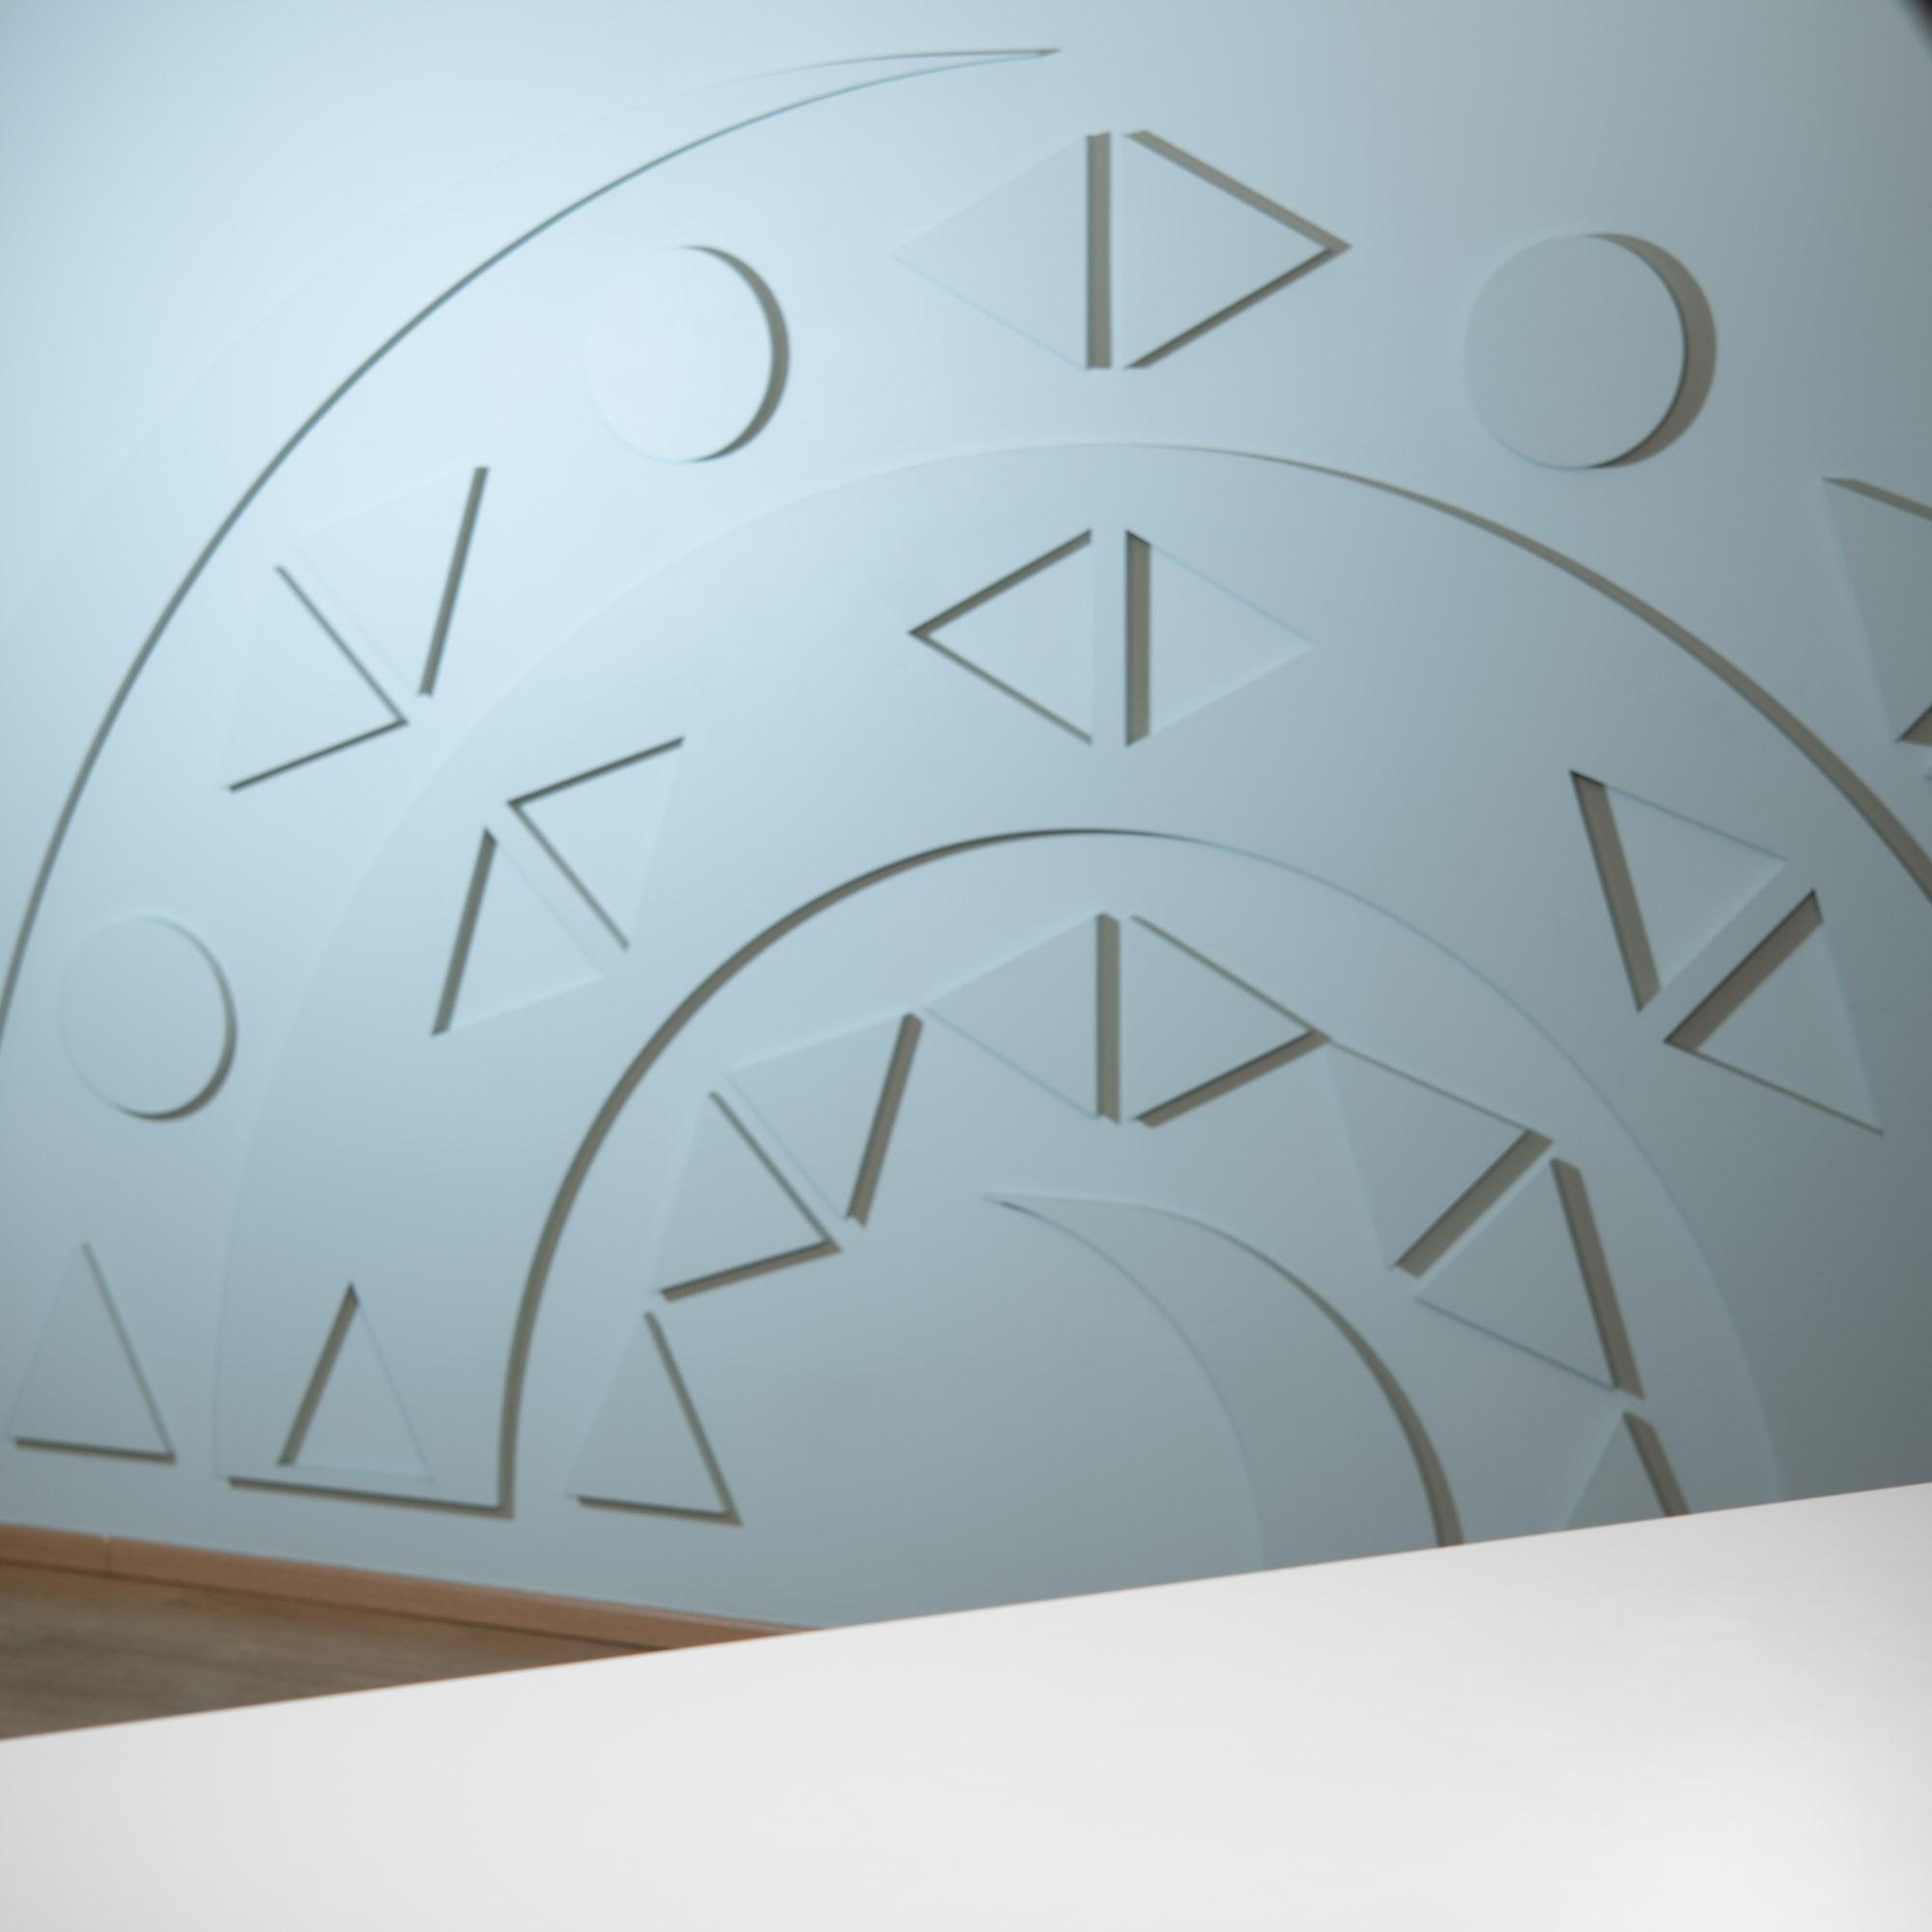 Persooni taust Soome Instituudi logoseinaga